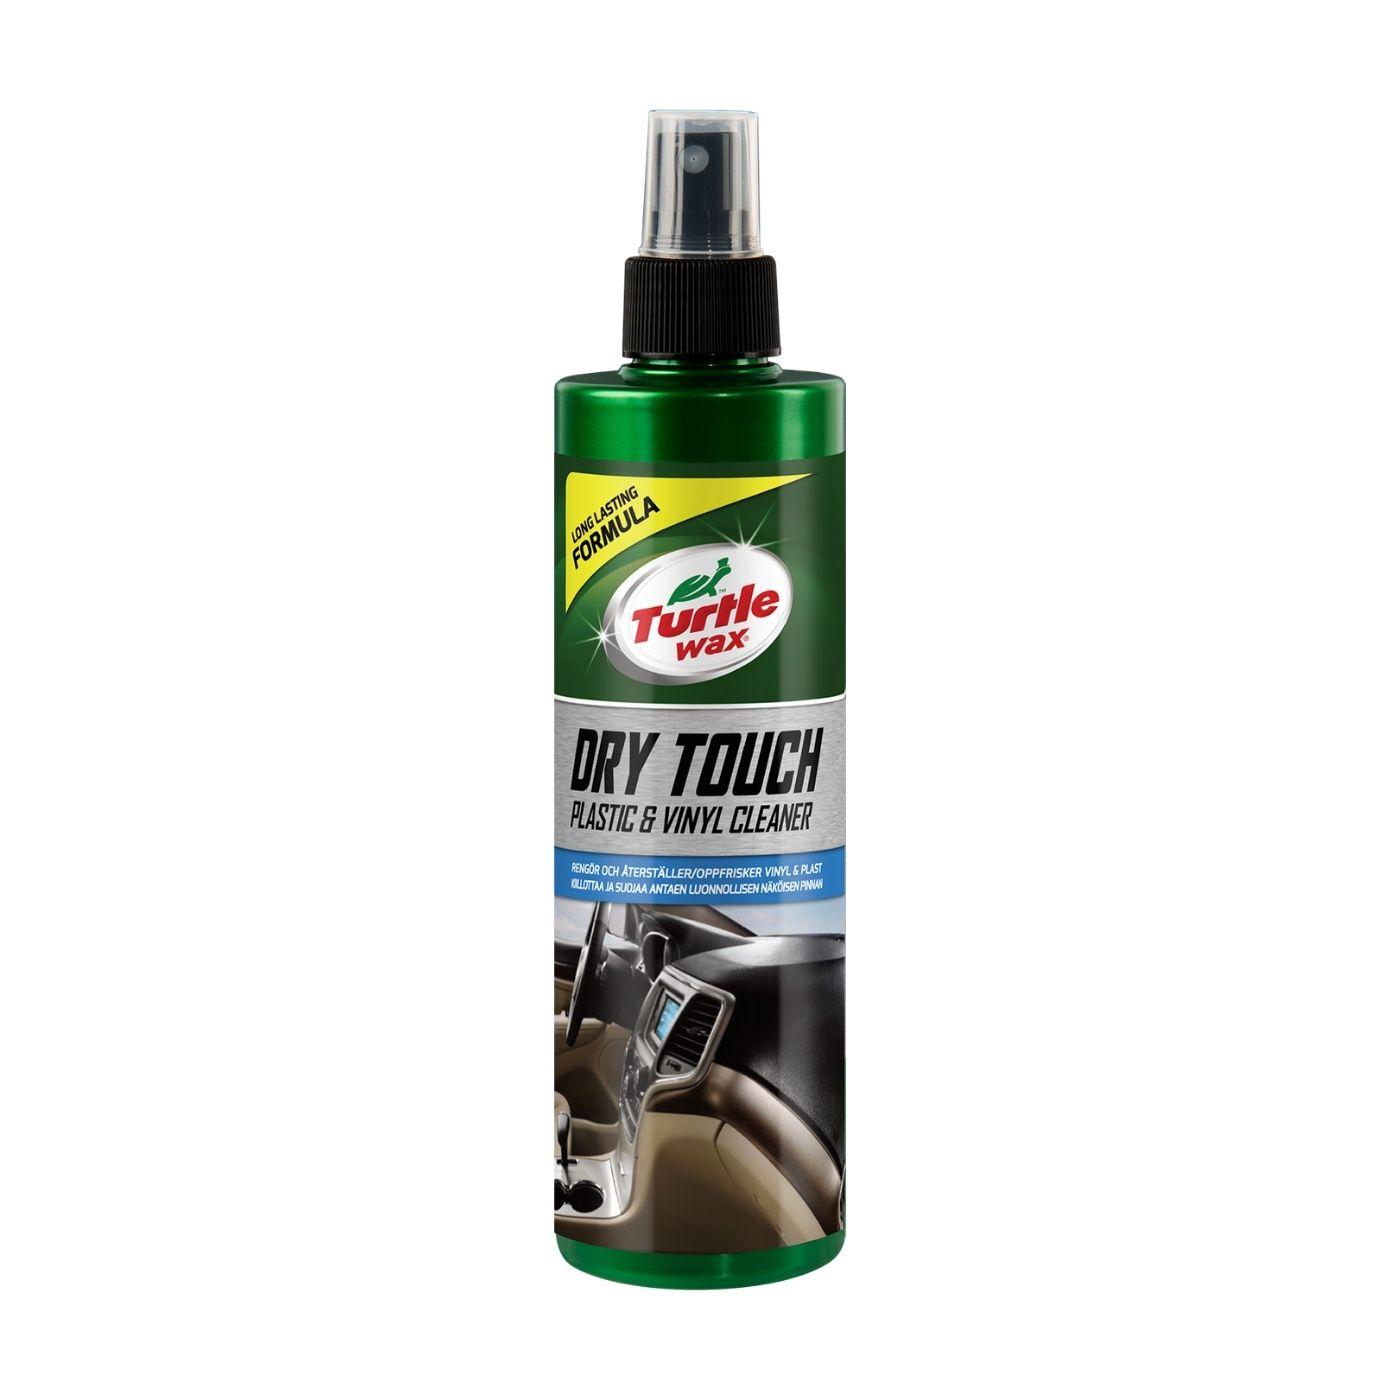 Plastbehandling Turtle Wax Dry Touch Plastic & Vinyl Cleaner, 300 ml